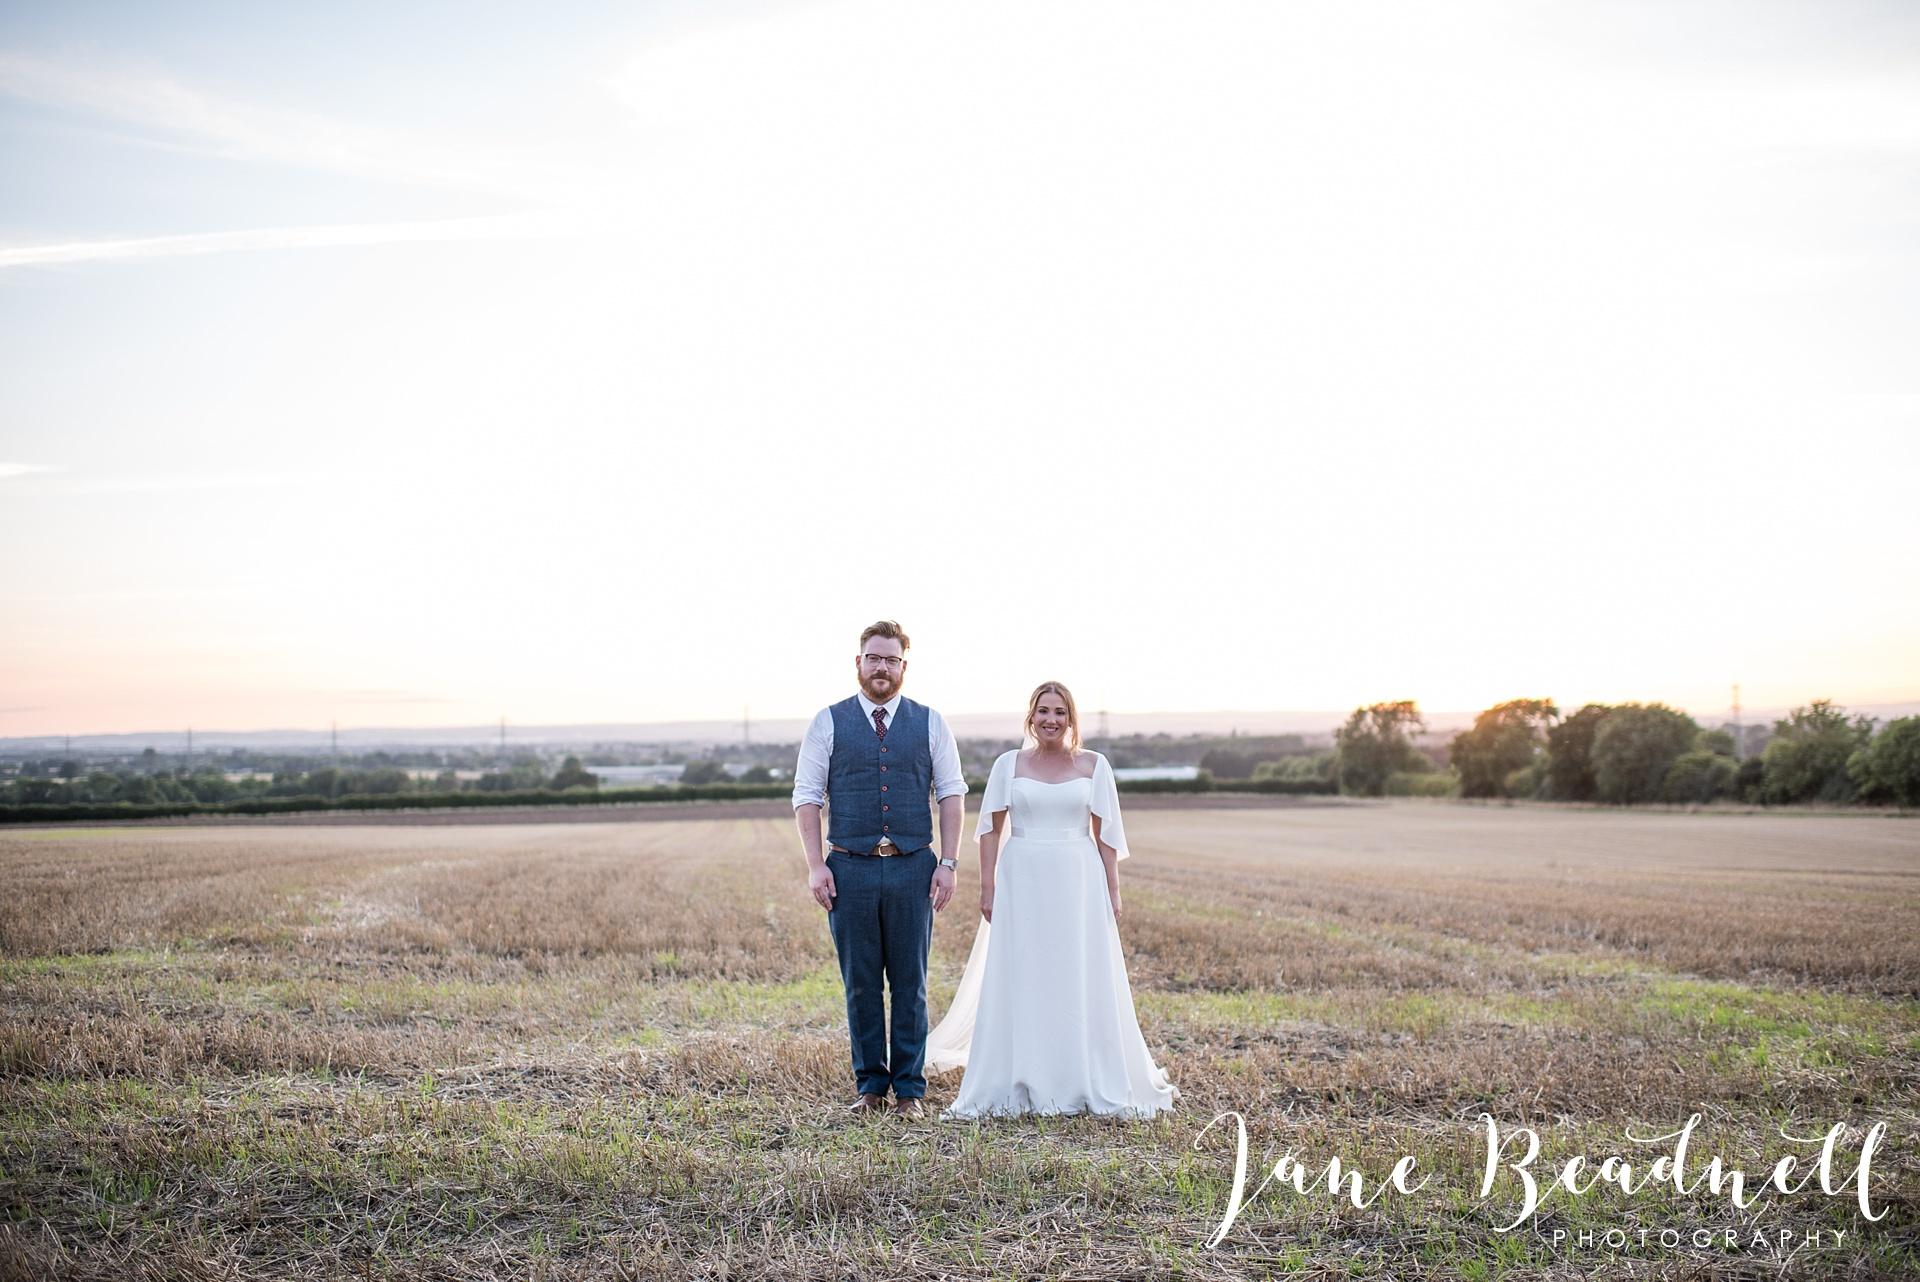 fine-art-wedding-photographer-jane-beadnell-yorkshire-wedding-photographer_0155